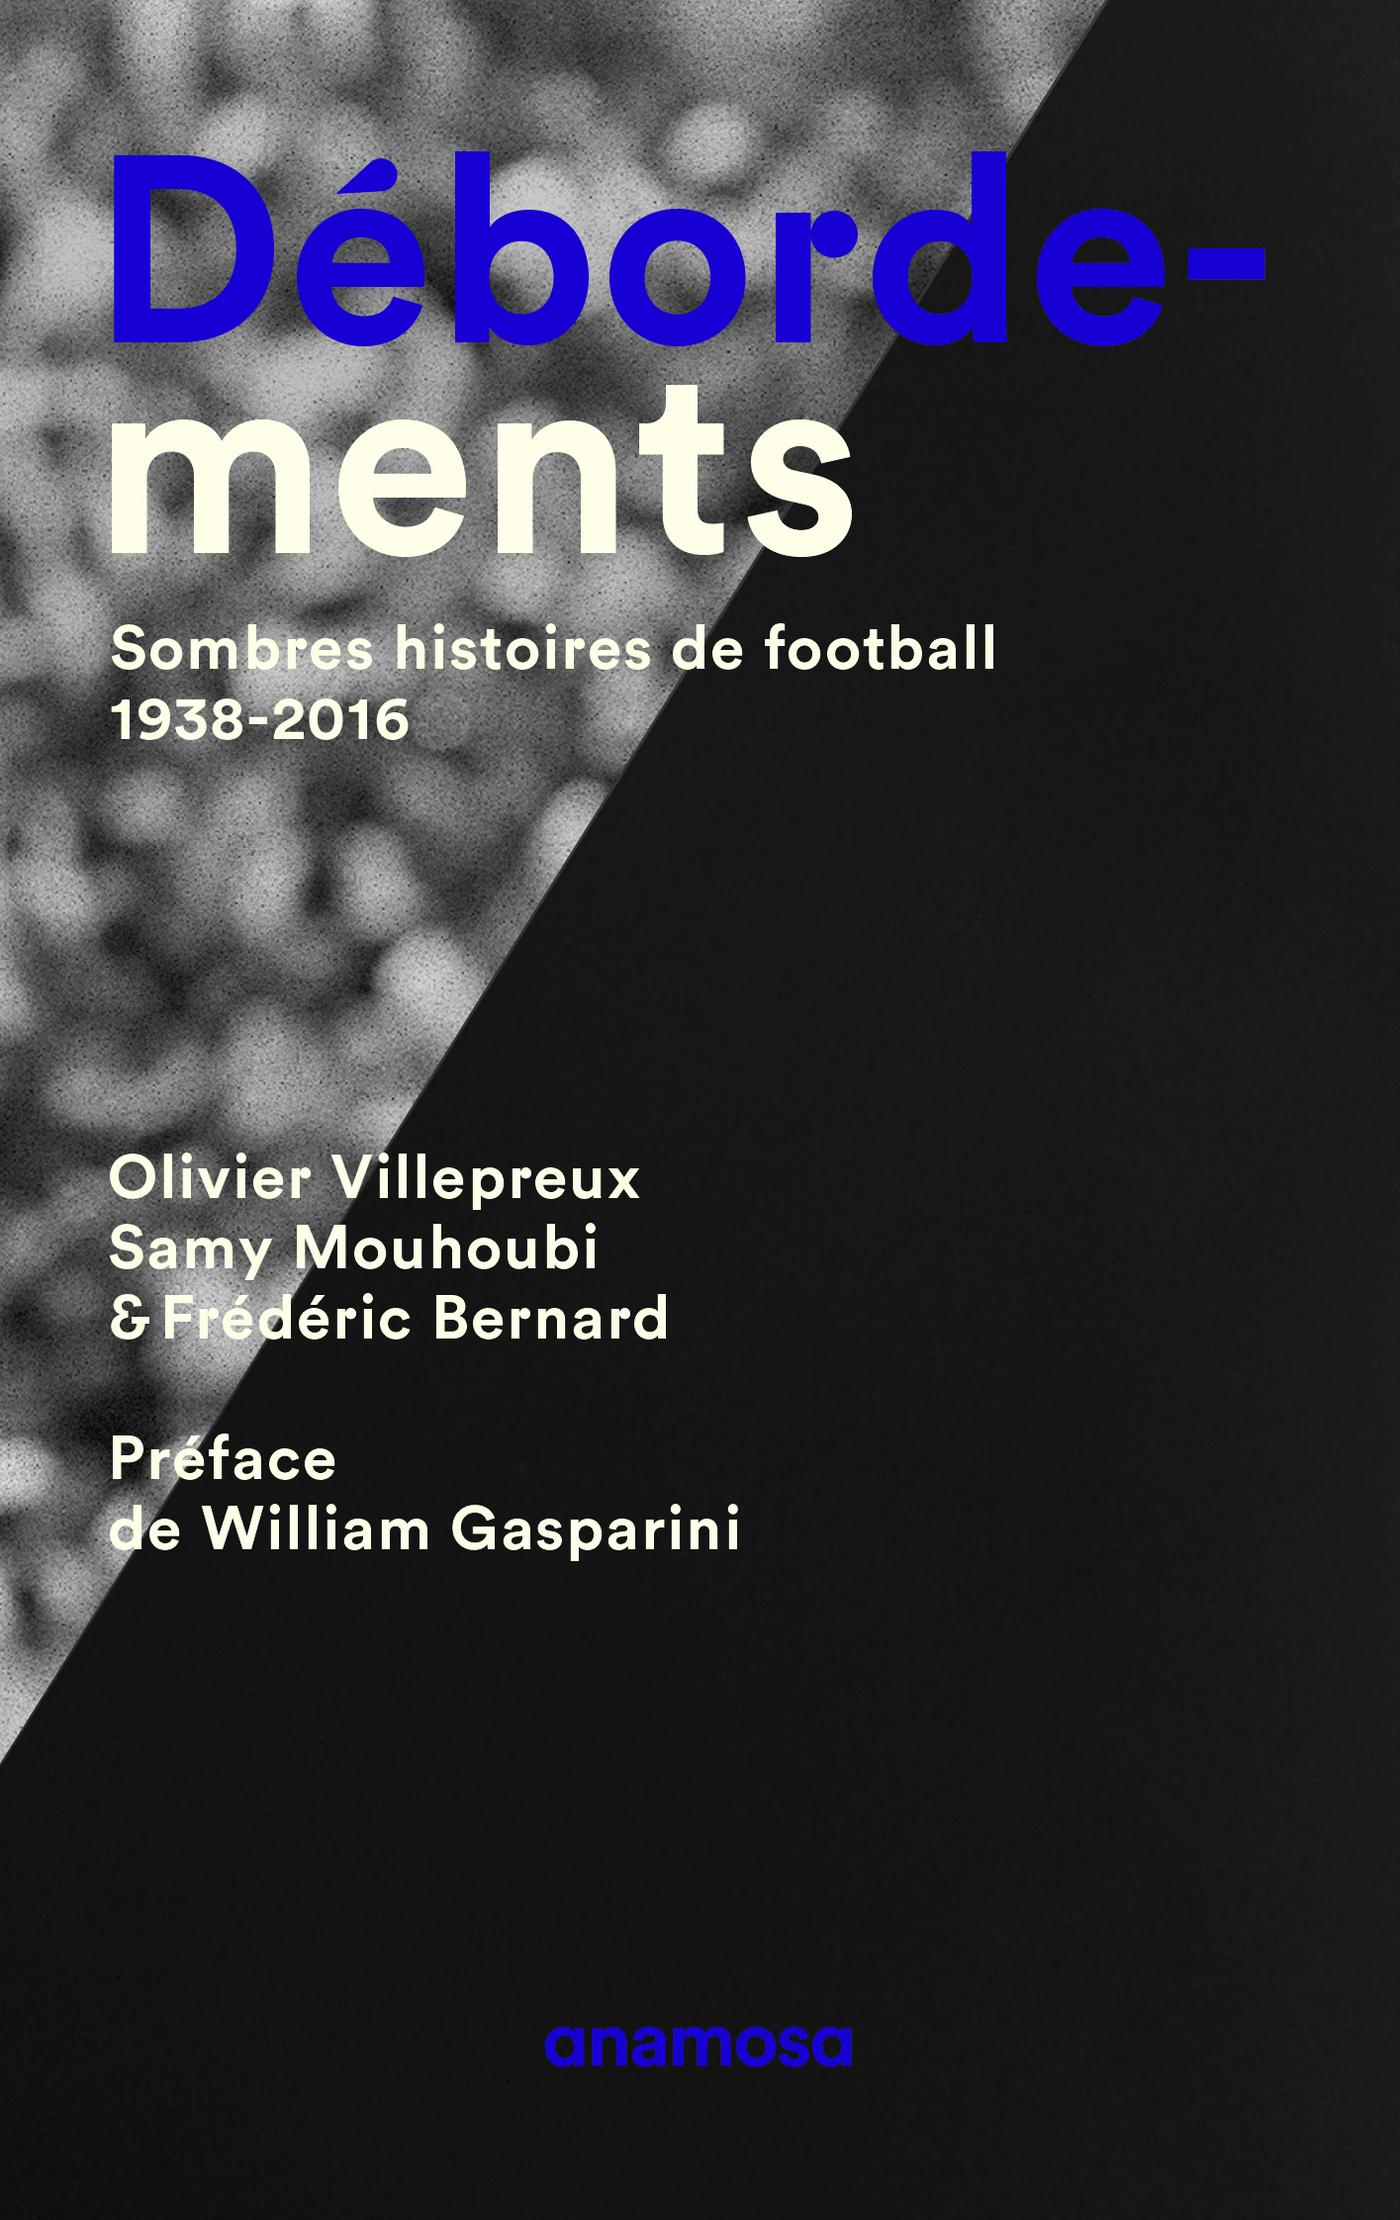 Débordements - Sombres histoires de football 1938-2016